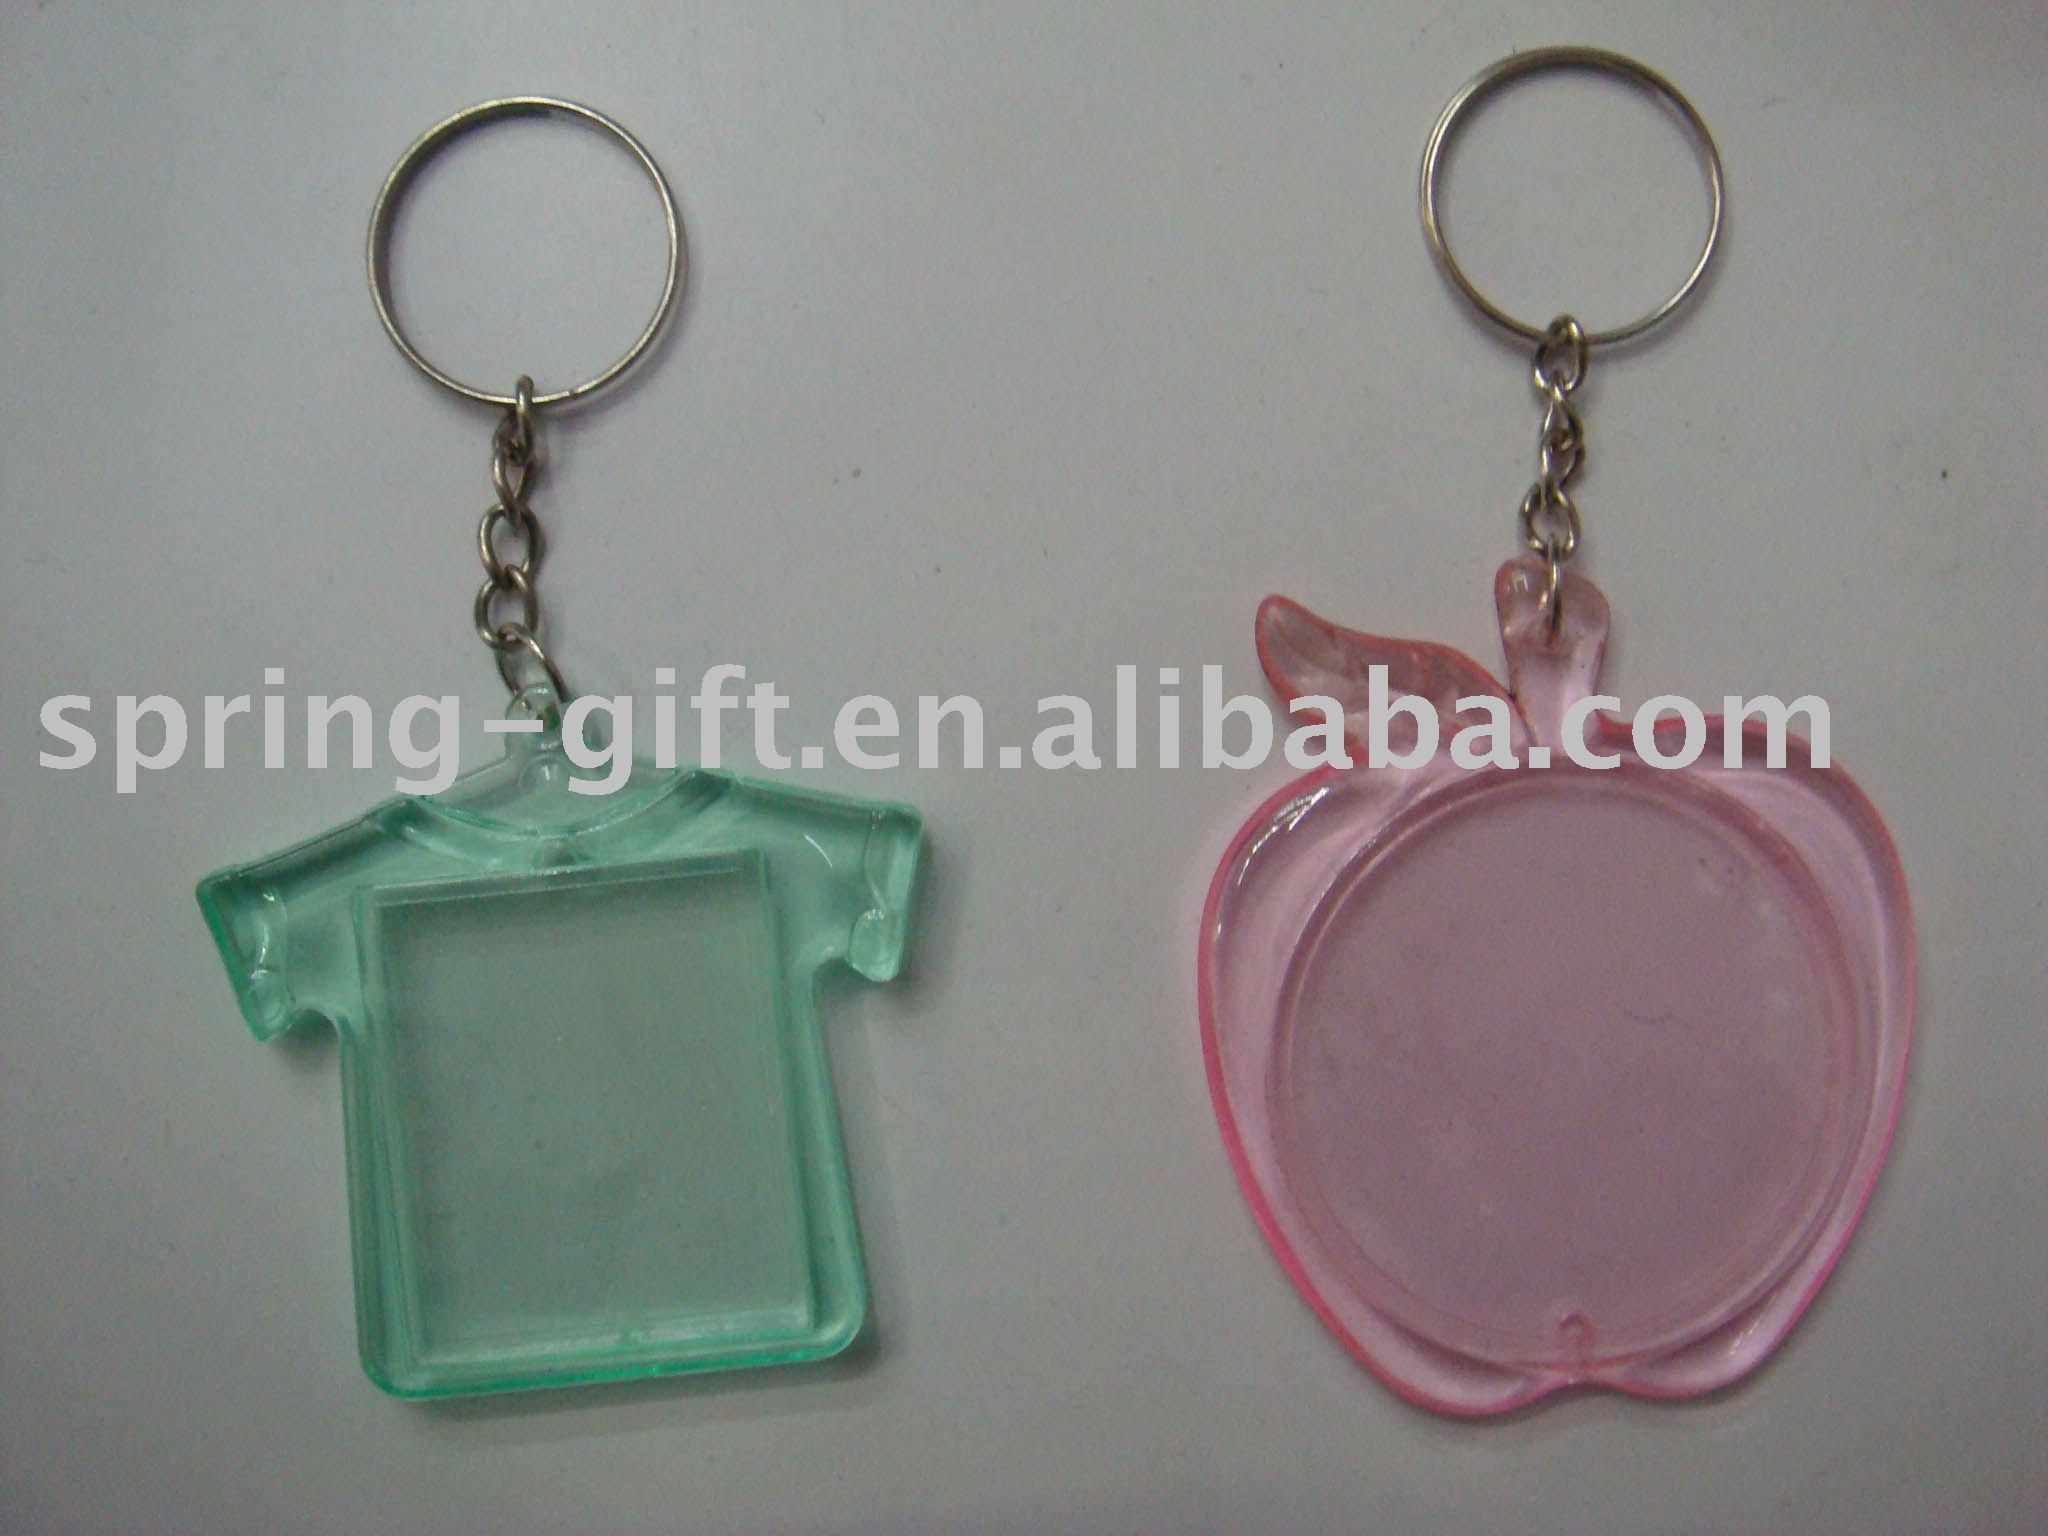 Blank Acrylic photo Key chain